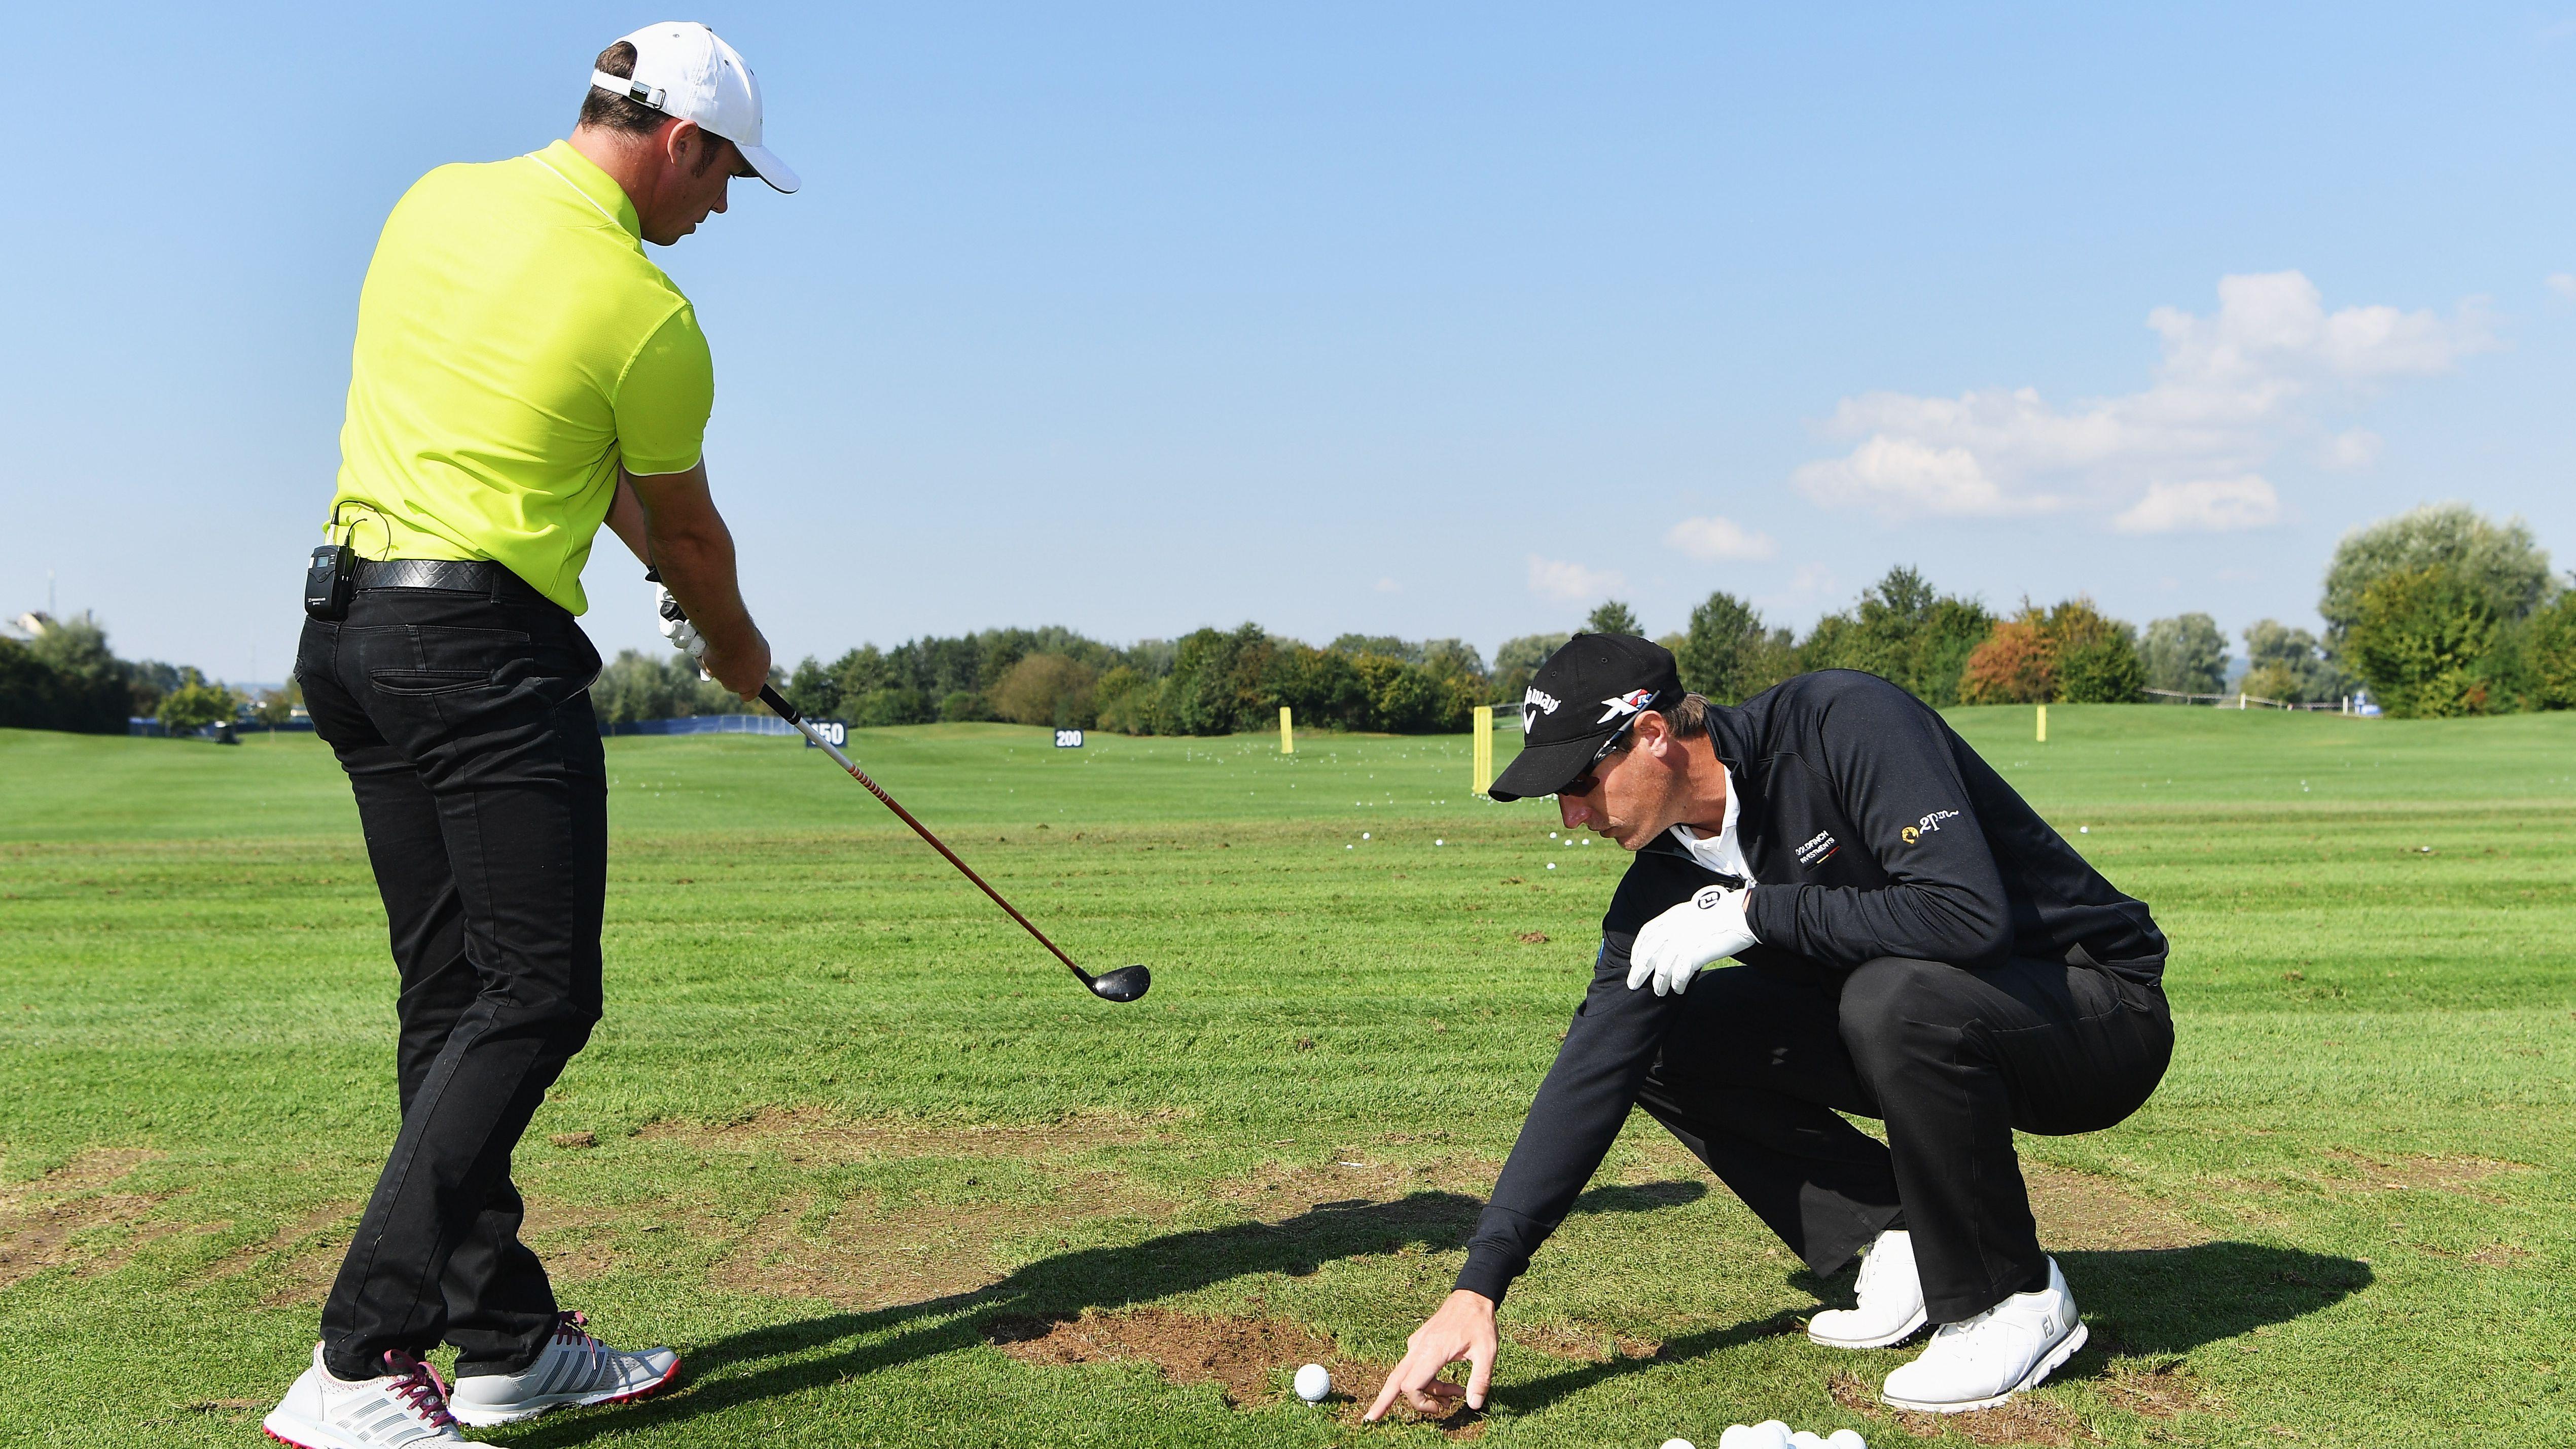 6 consejos fantásticos para consolidar tu golf.